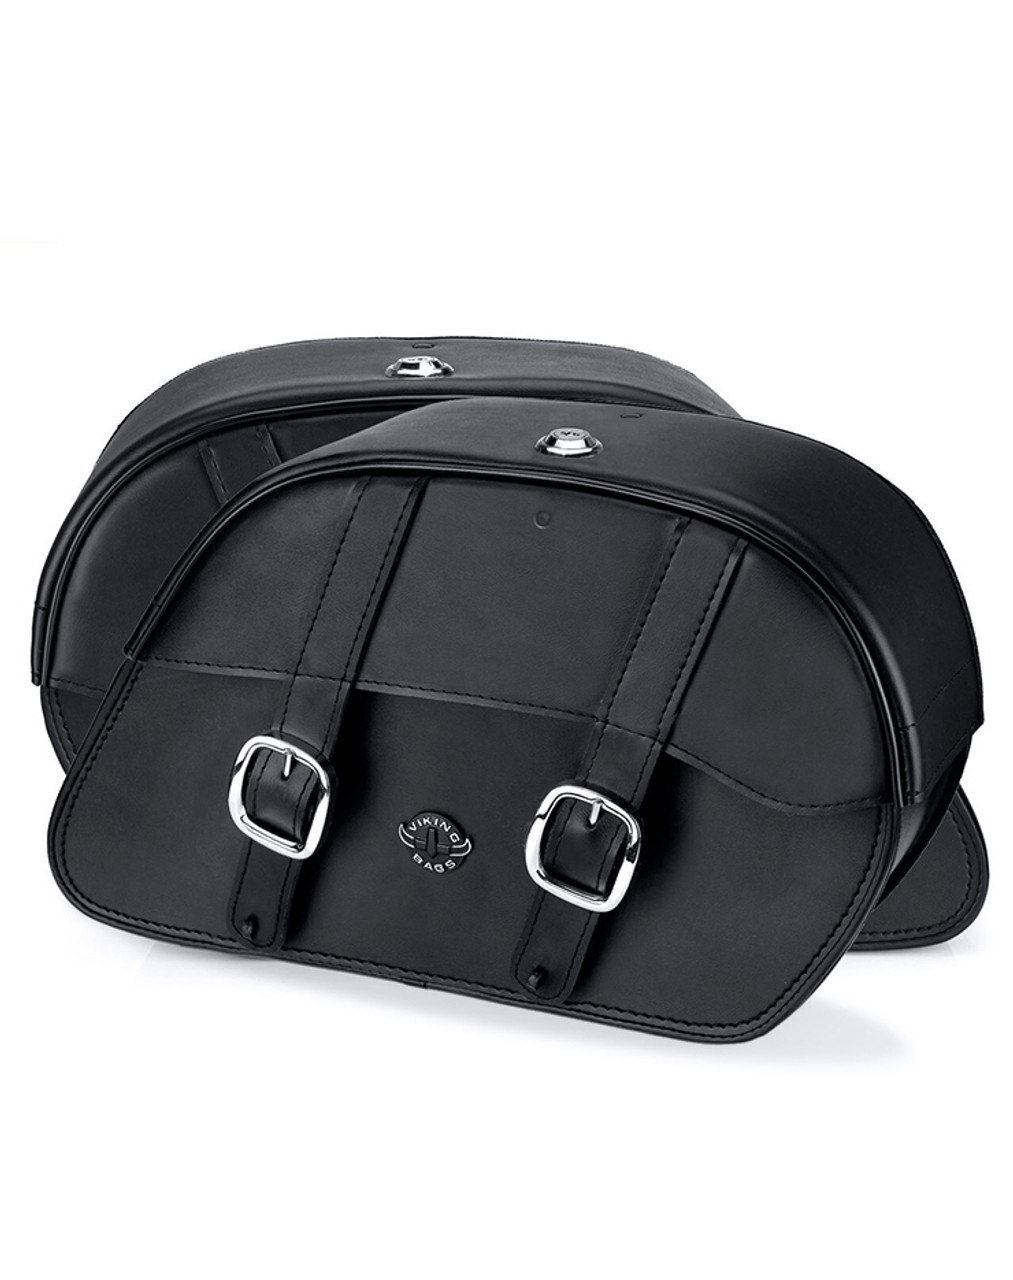 VikingBags Skarner Large Double Strap Yamaha Startoliner XV 1900 Leather Motorcycle Saddlebags Both Bags View